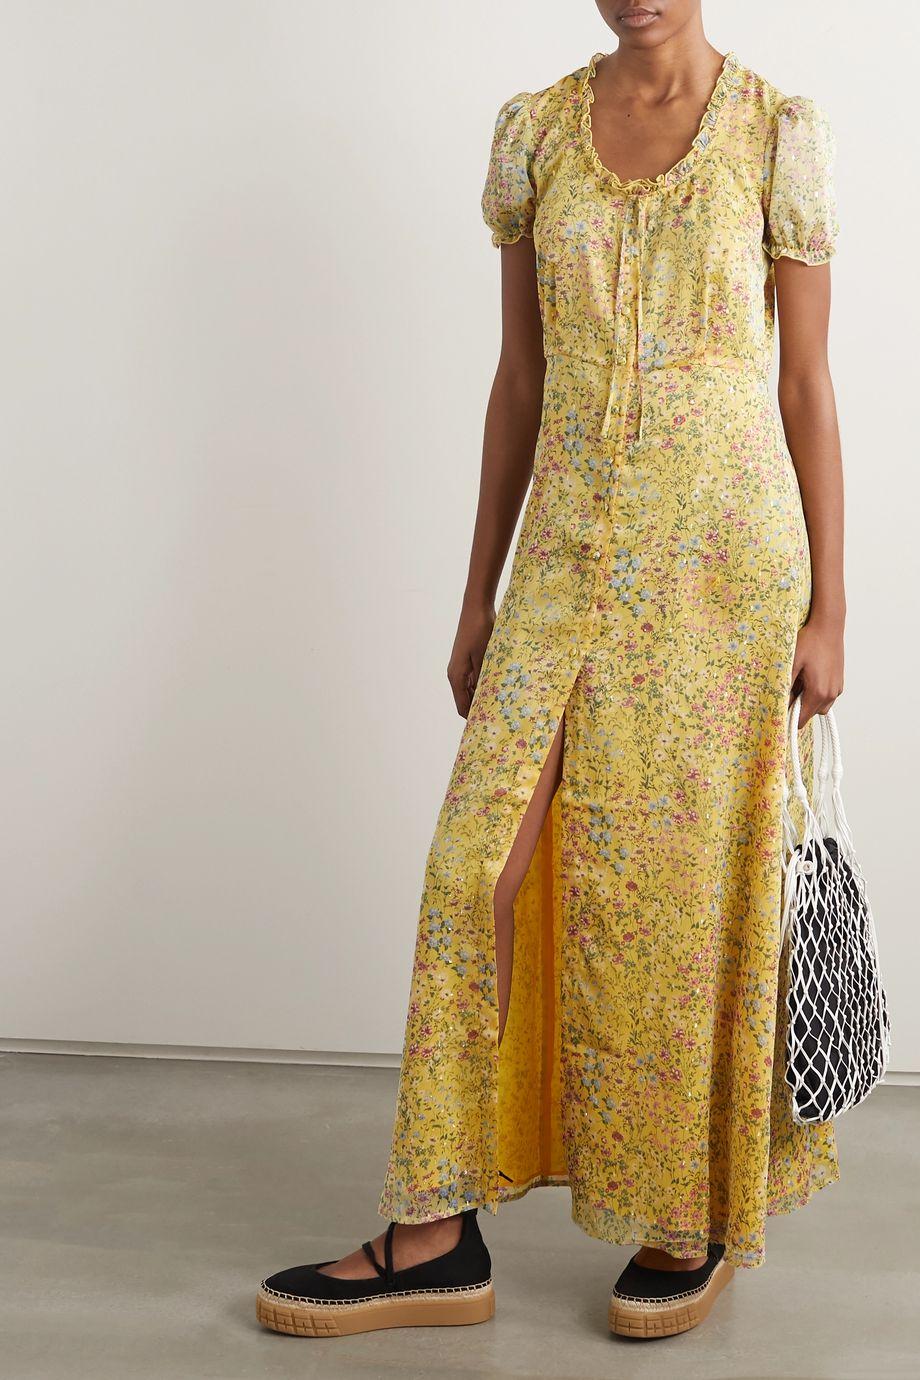 R13 Ruffled floral-print fil coupé georgette maxi dress